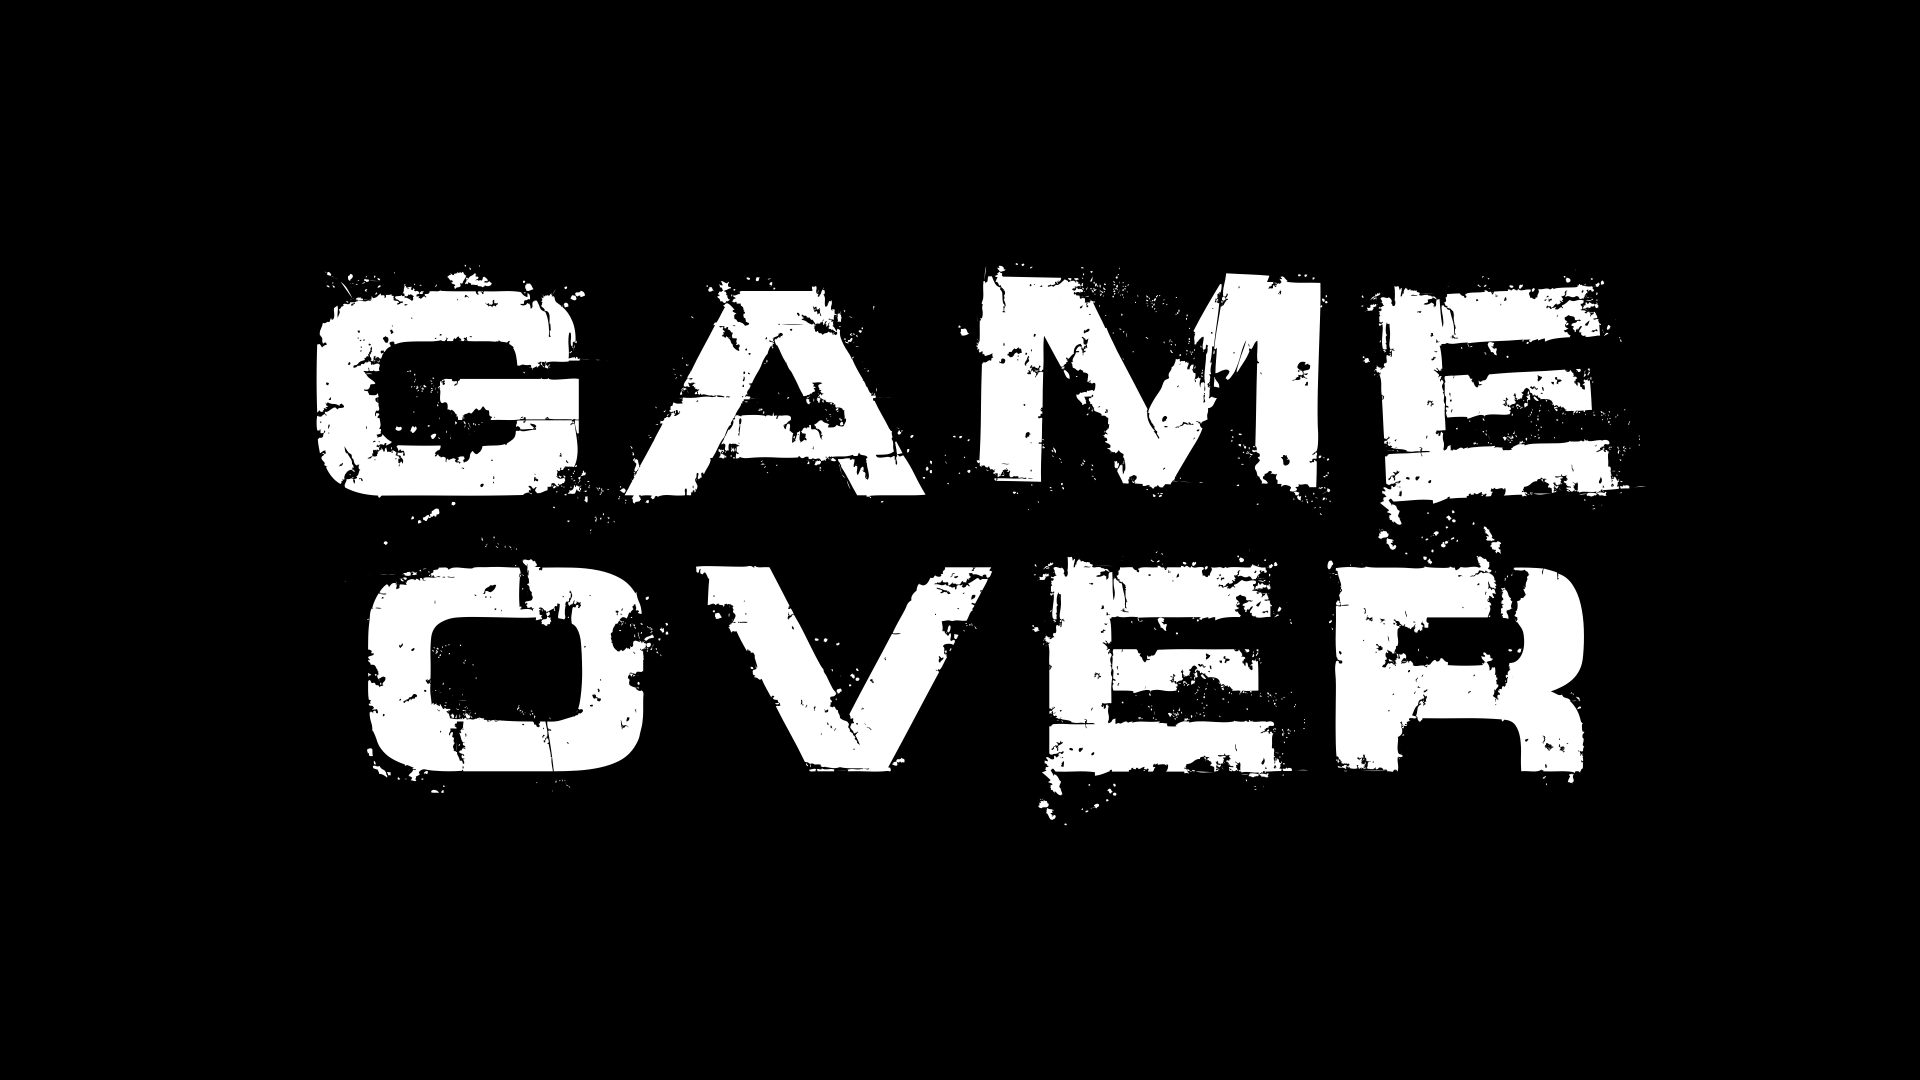 [68+] Game Over Wallpaper on WallpaperSafari